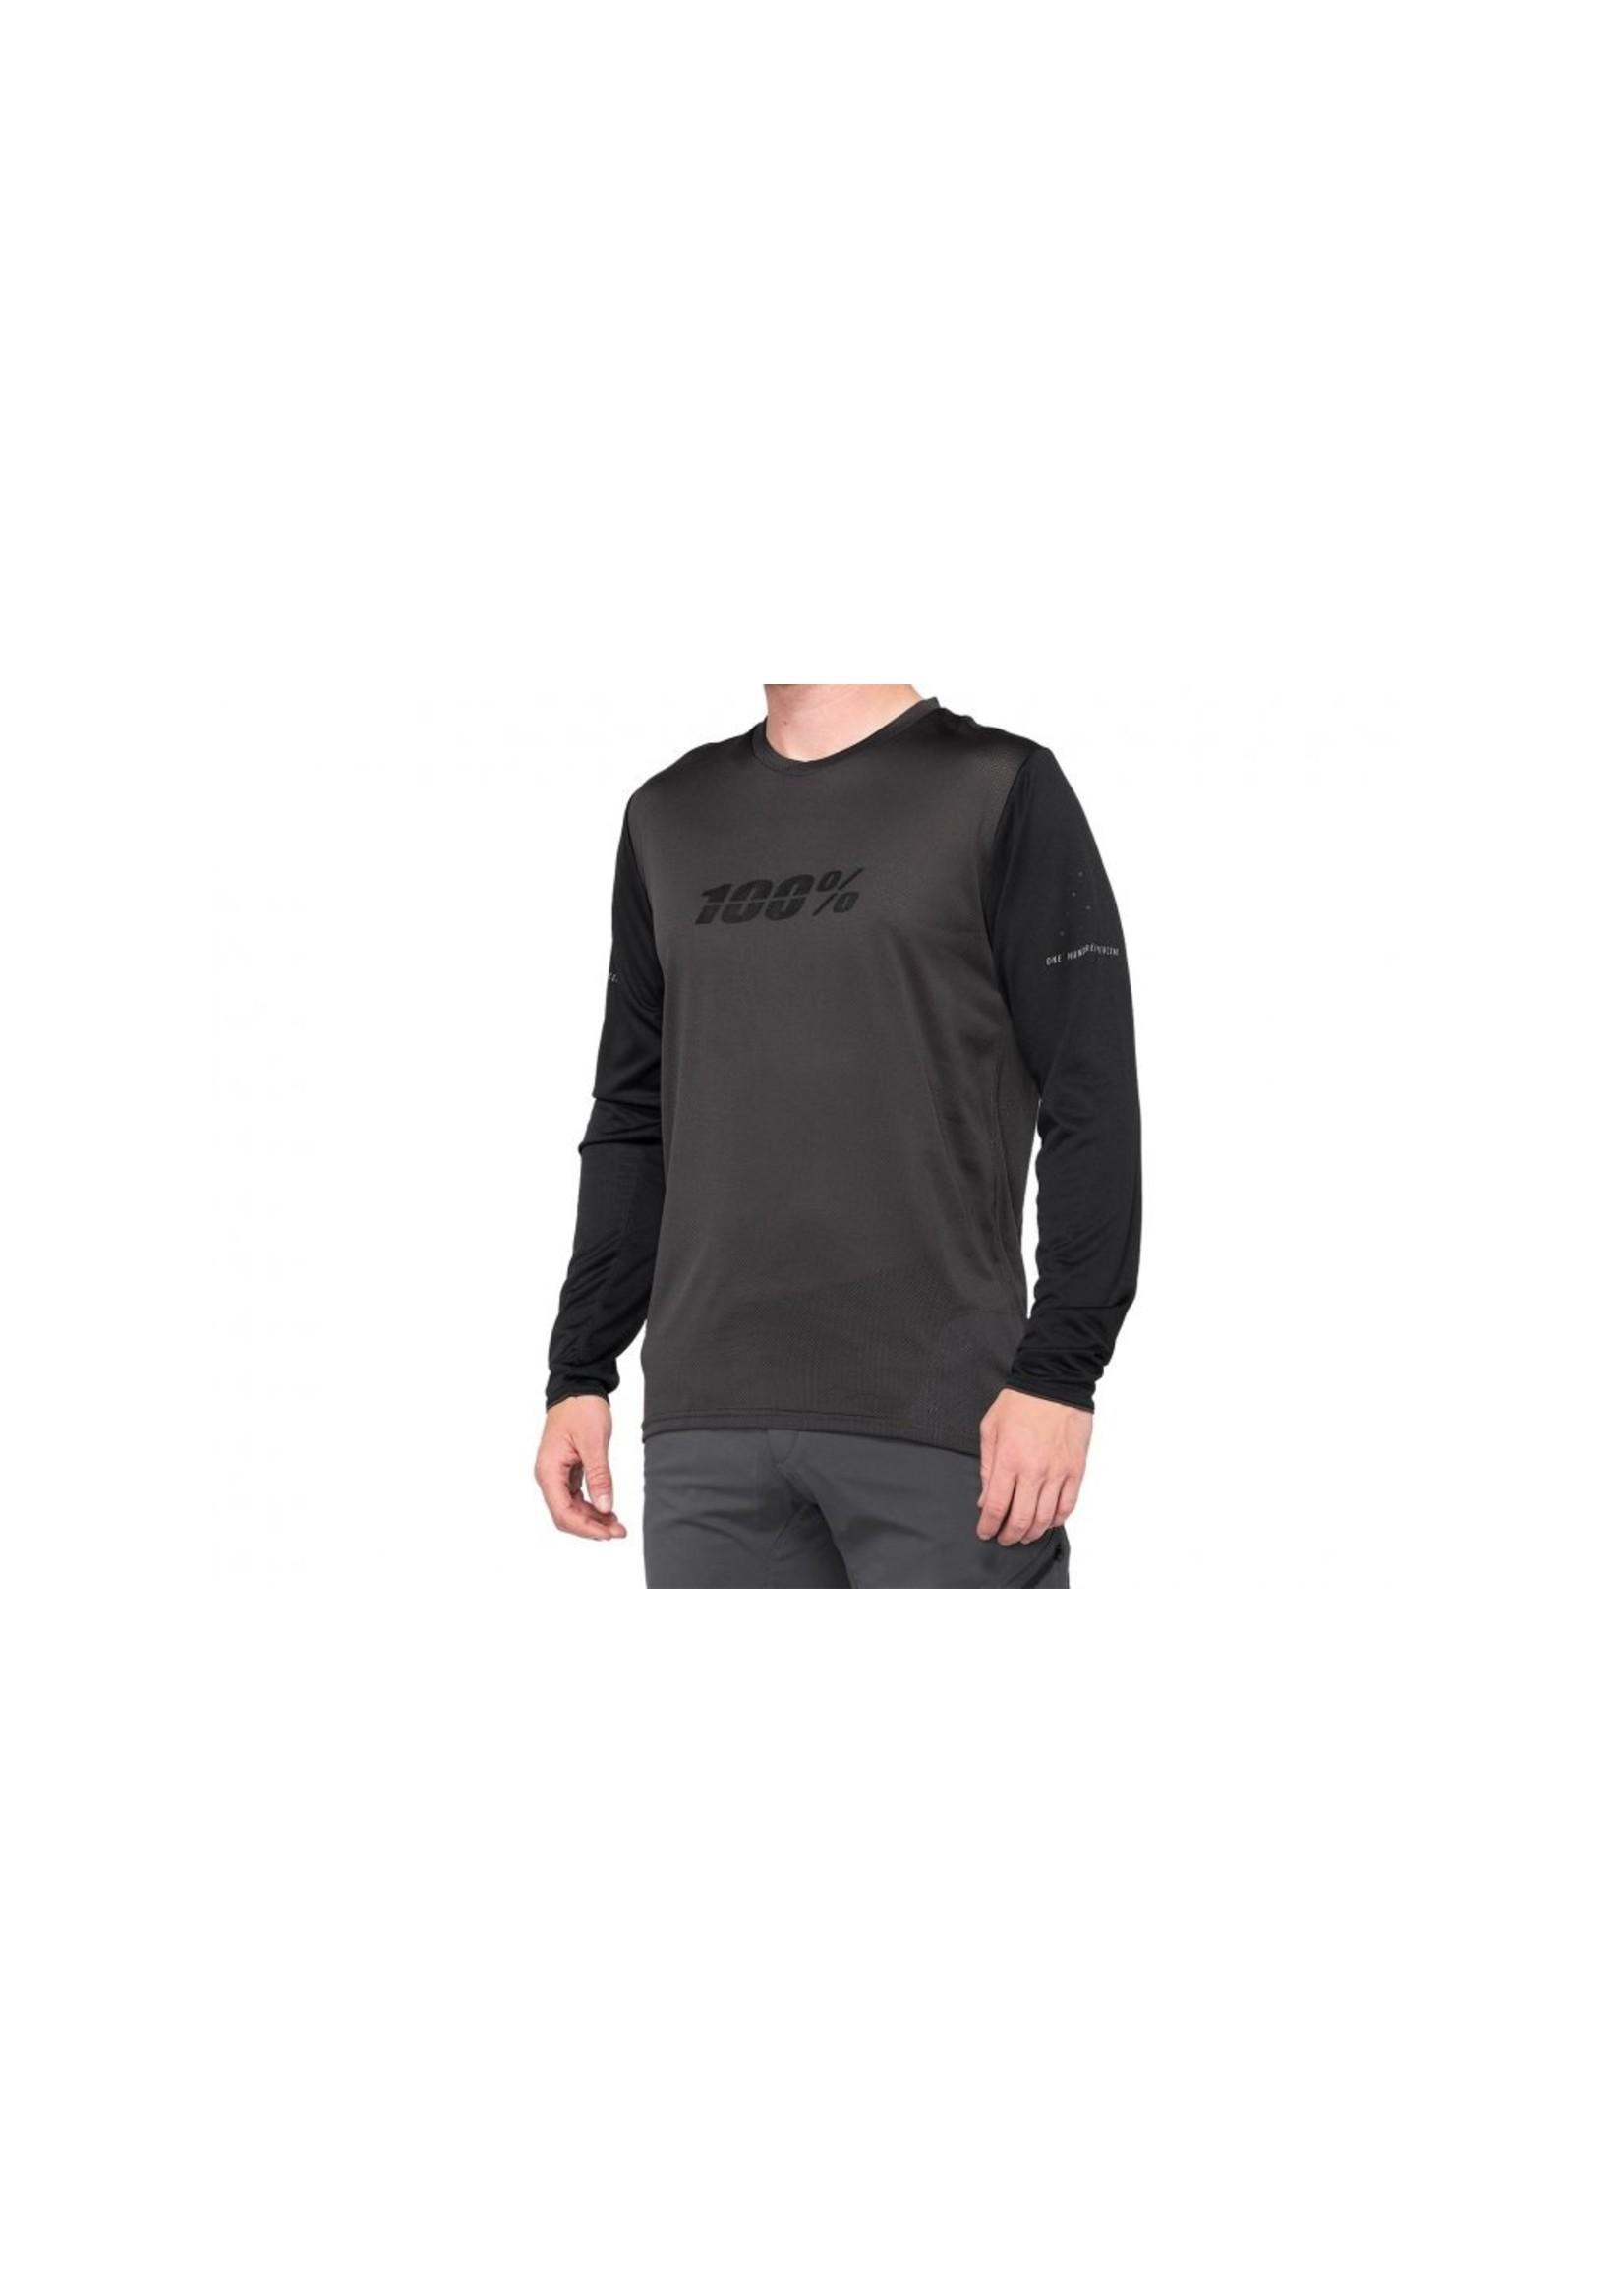 100% 100% RideCamp Long Sleeve Jersey, Men's